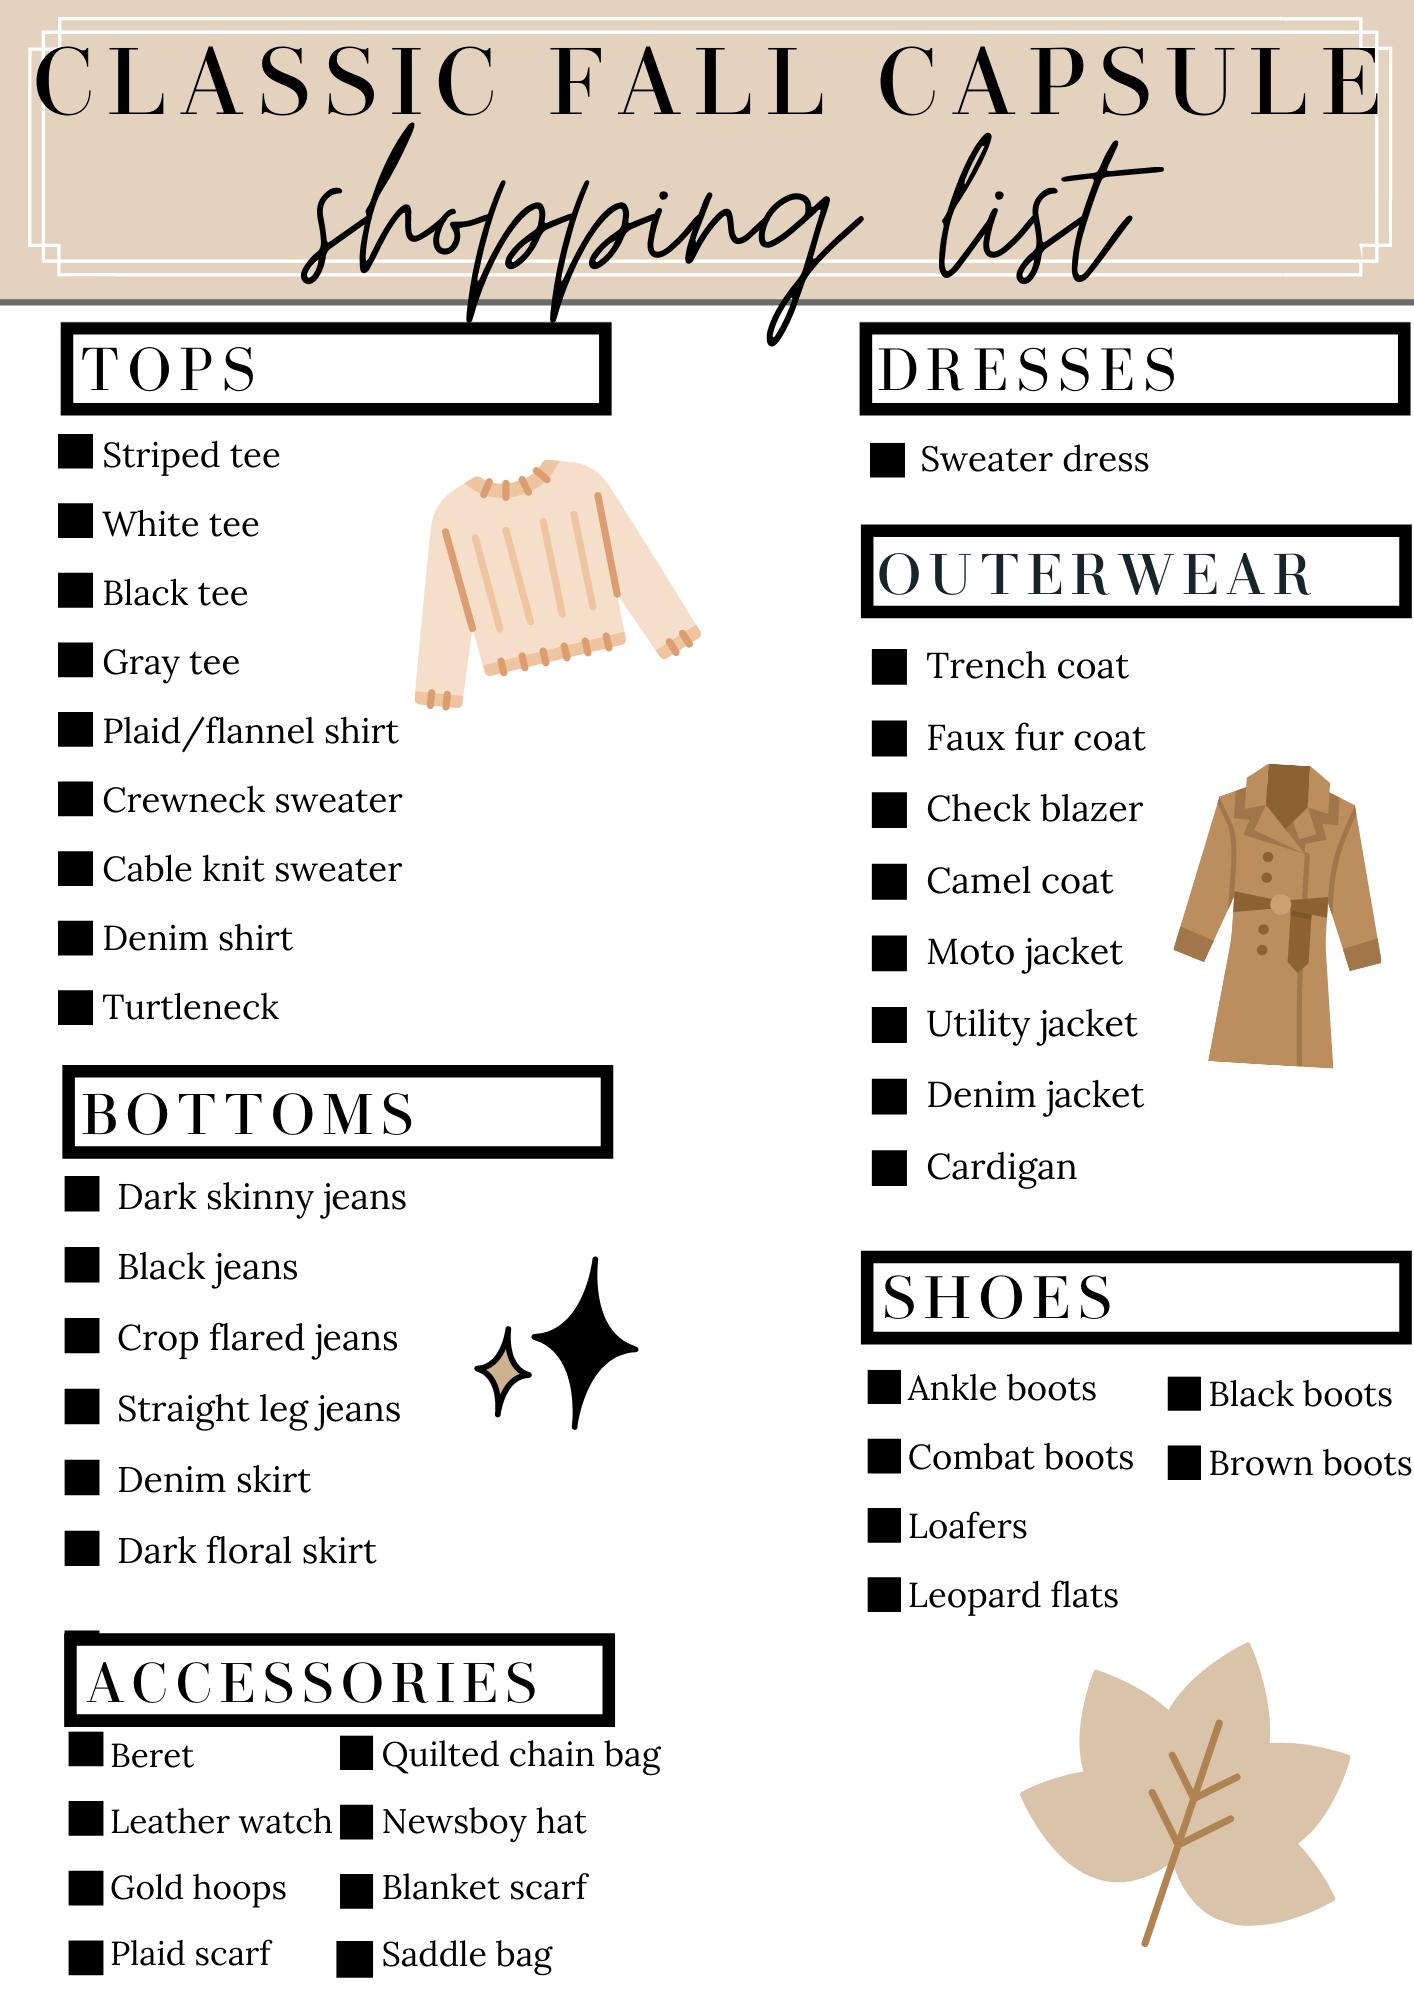 fall capsule wardrobe shopping list